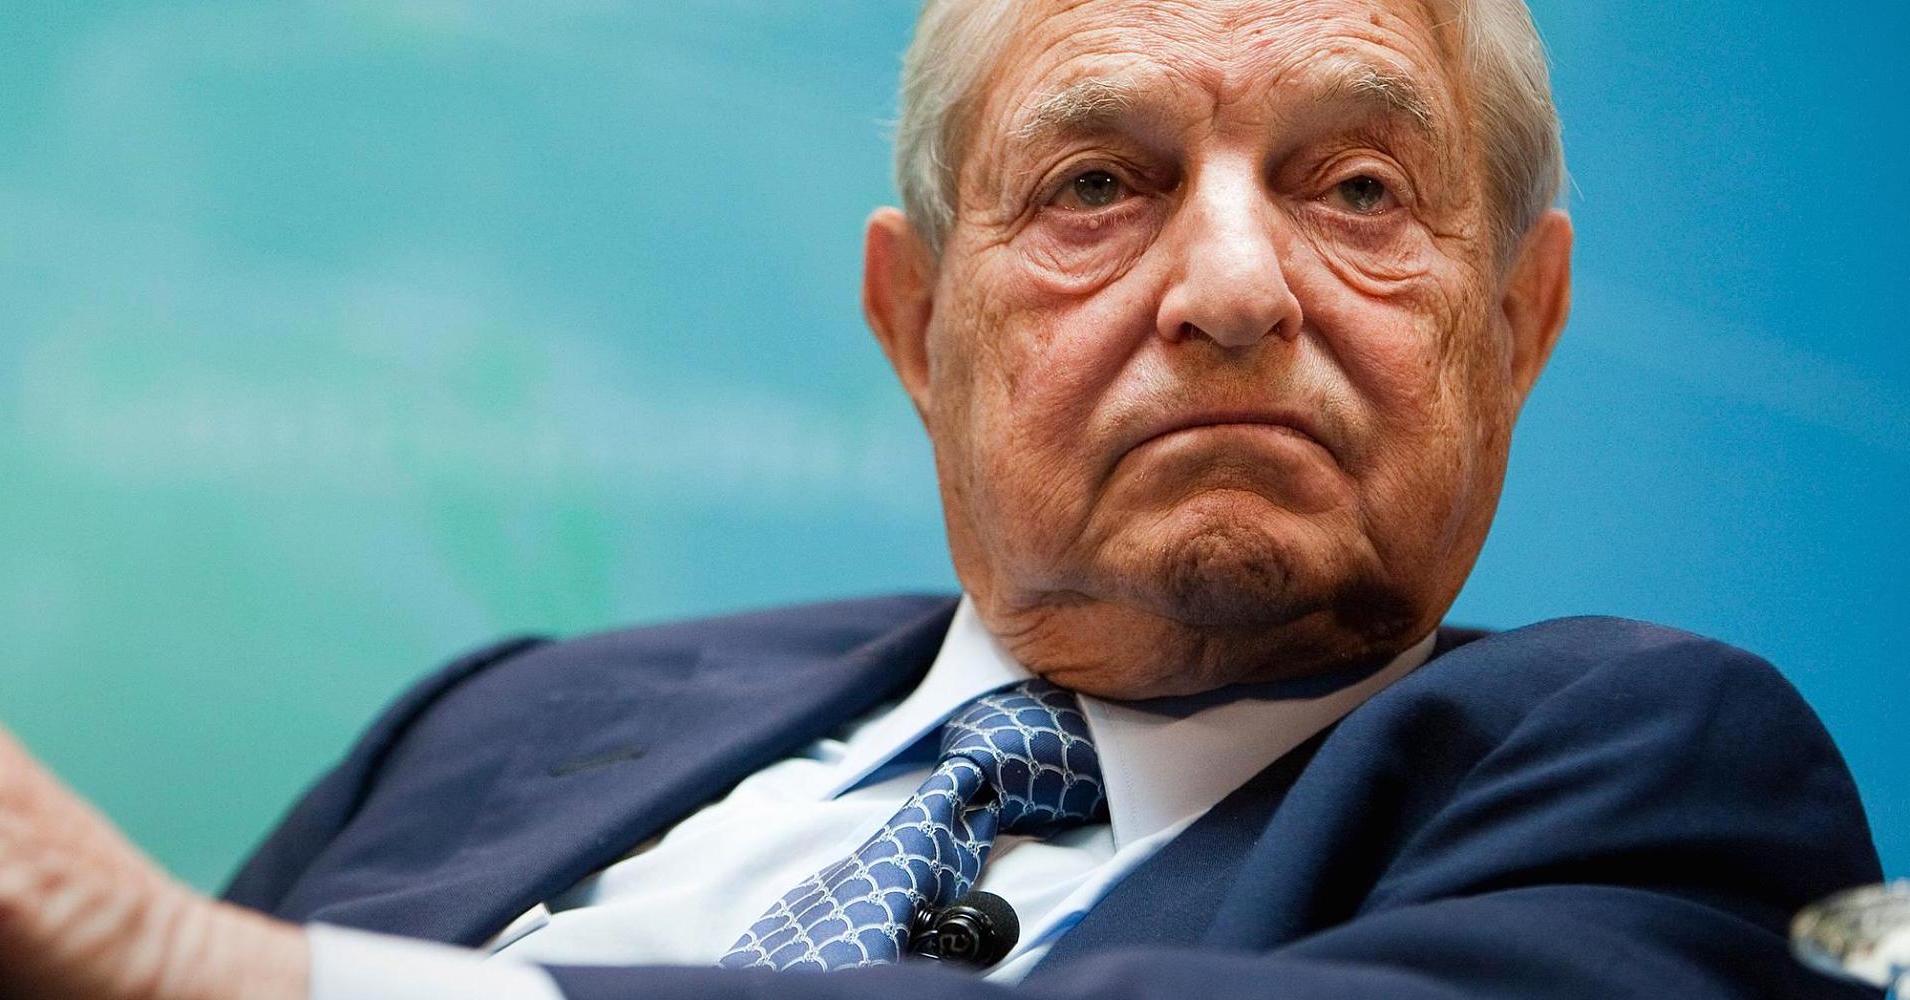 Facebook Versus Soros Who S Shorting Whom